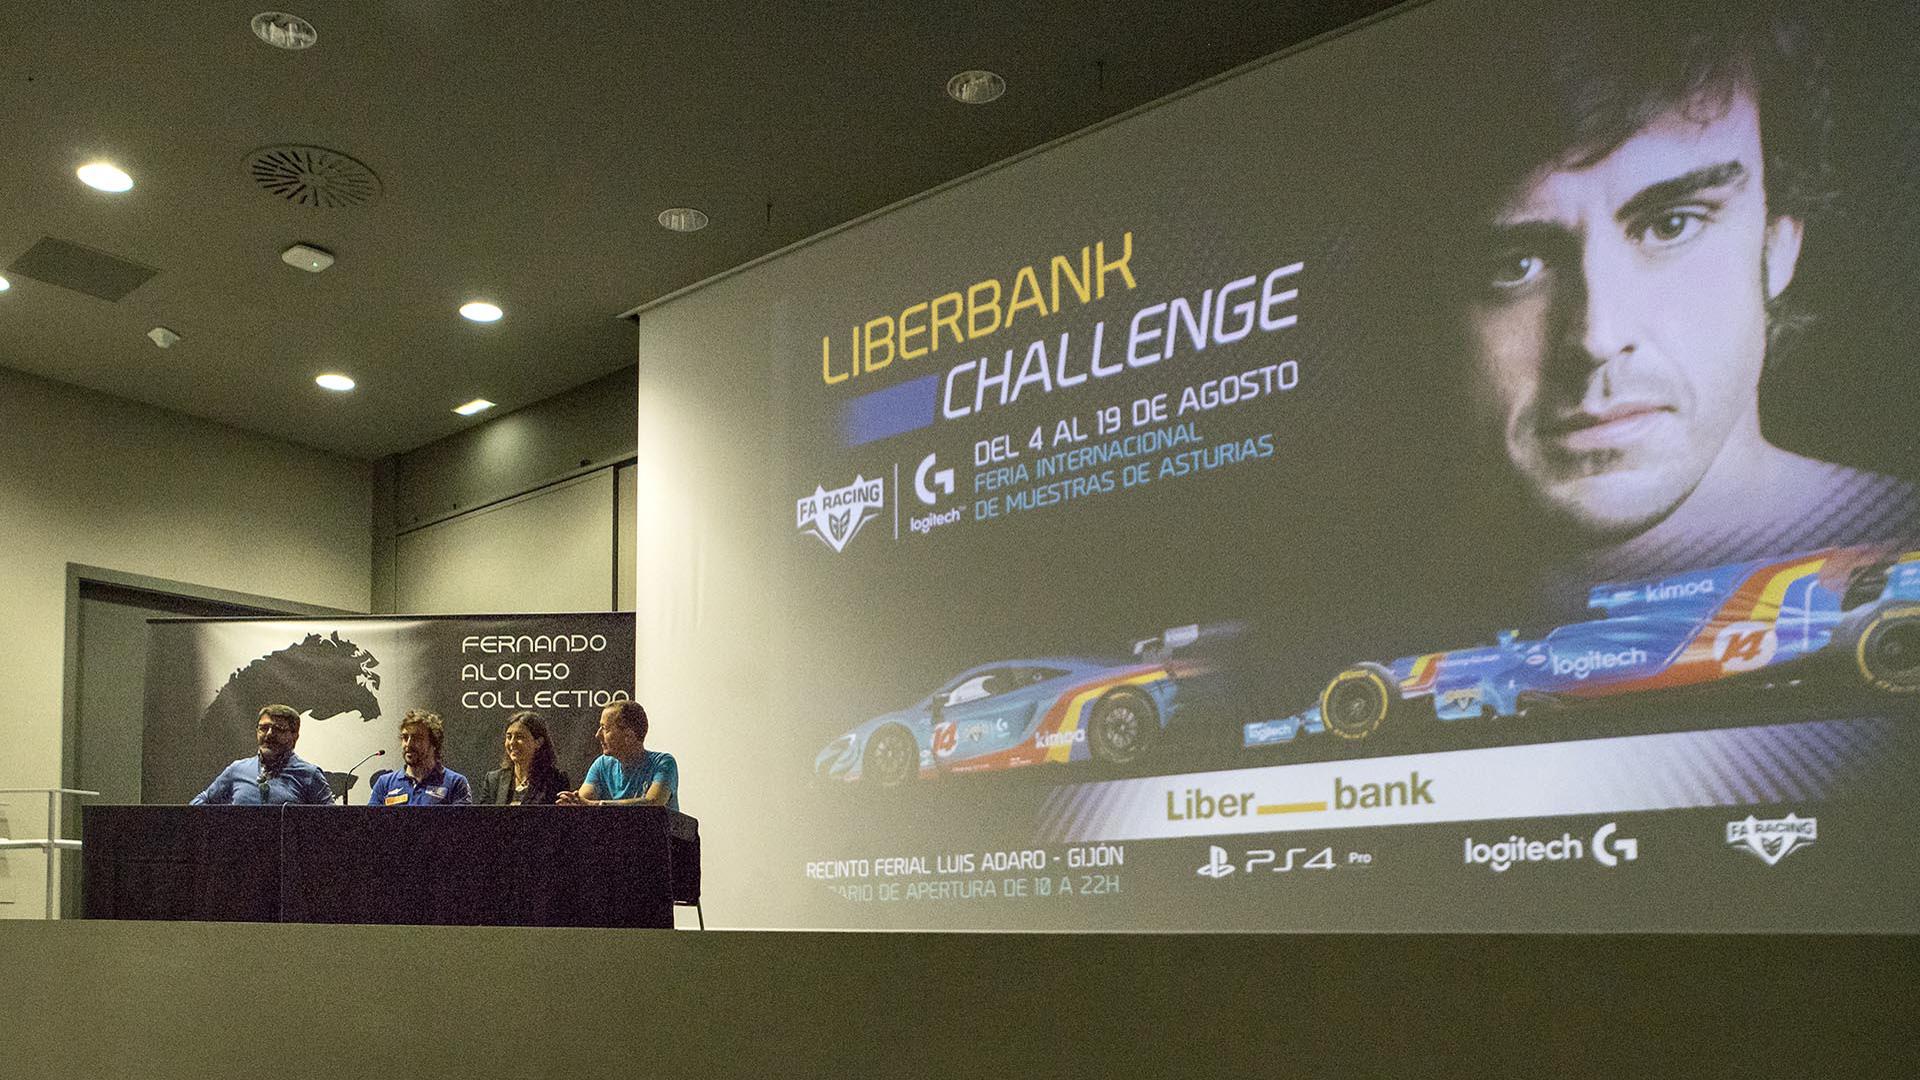 http://www.idgtv.es/archivos/201807/fernando-alonso-liberbank-challenge-img1.jpg